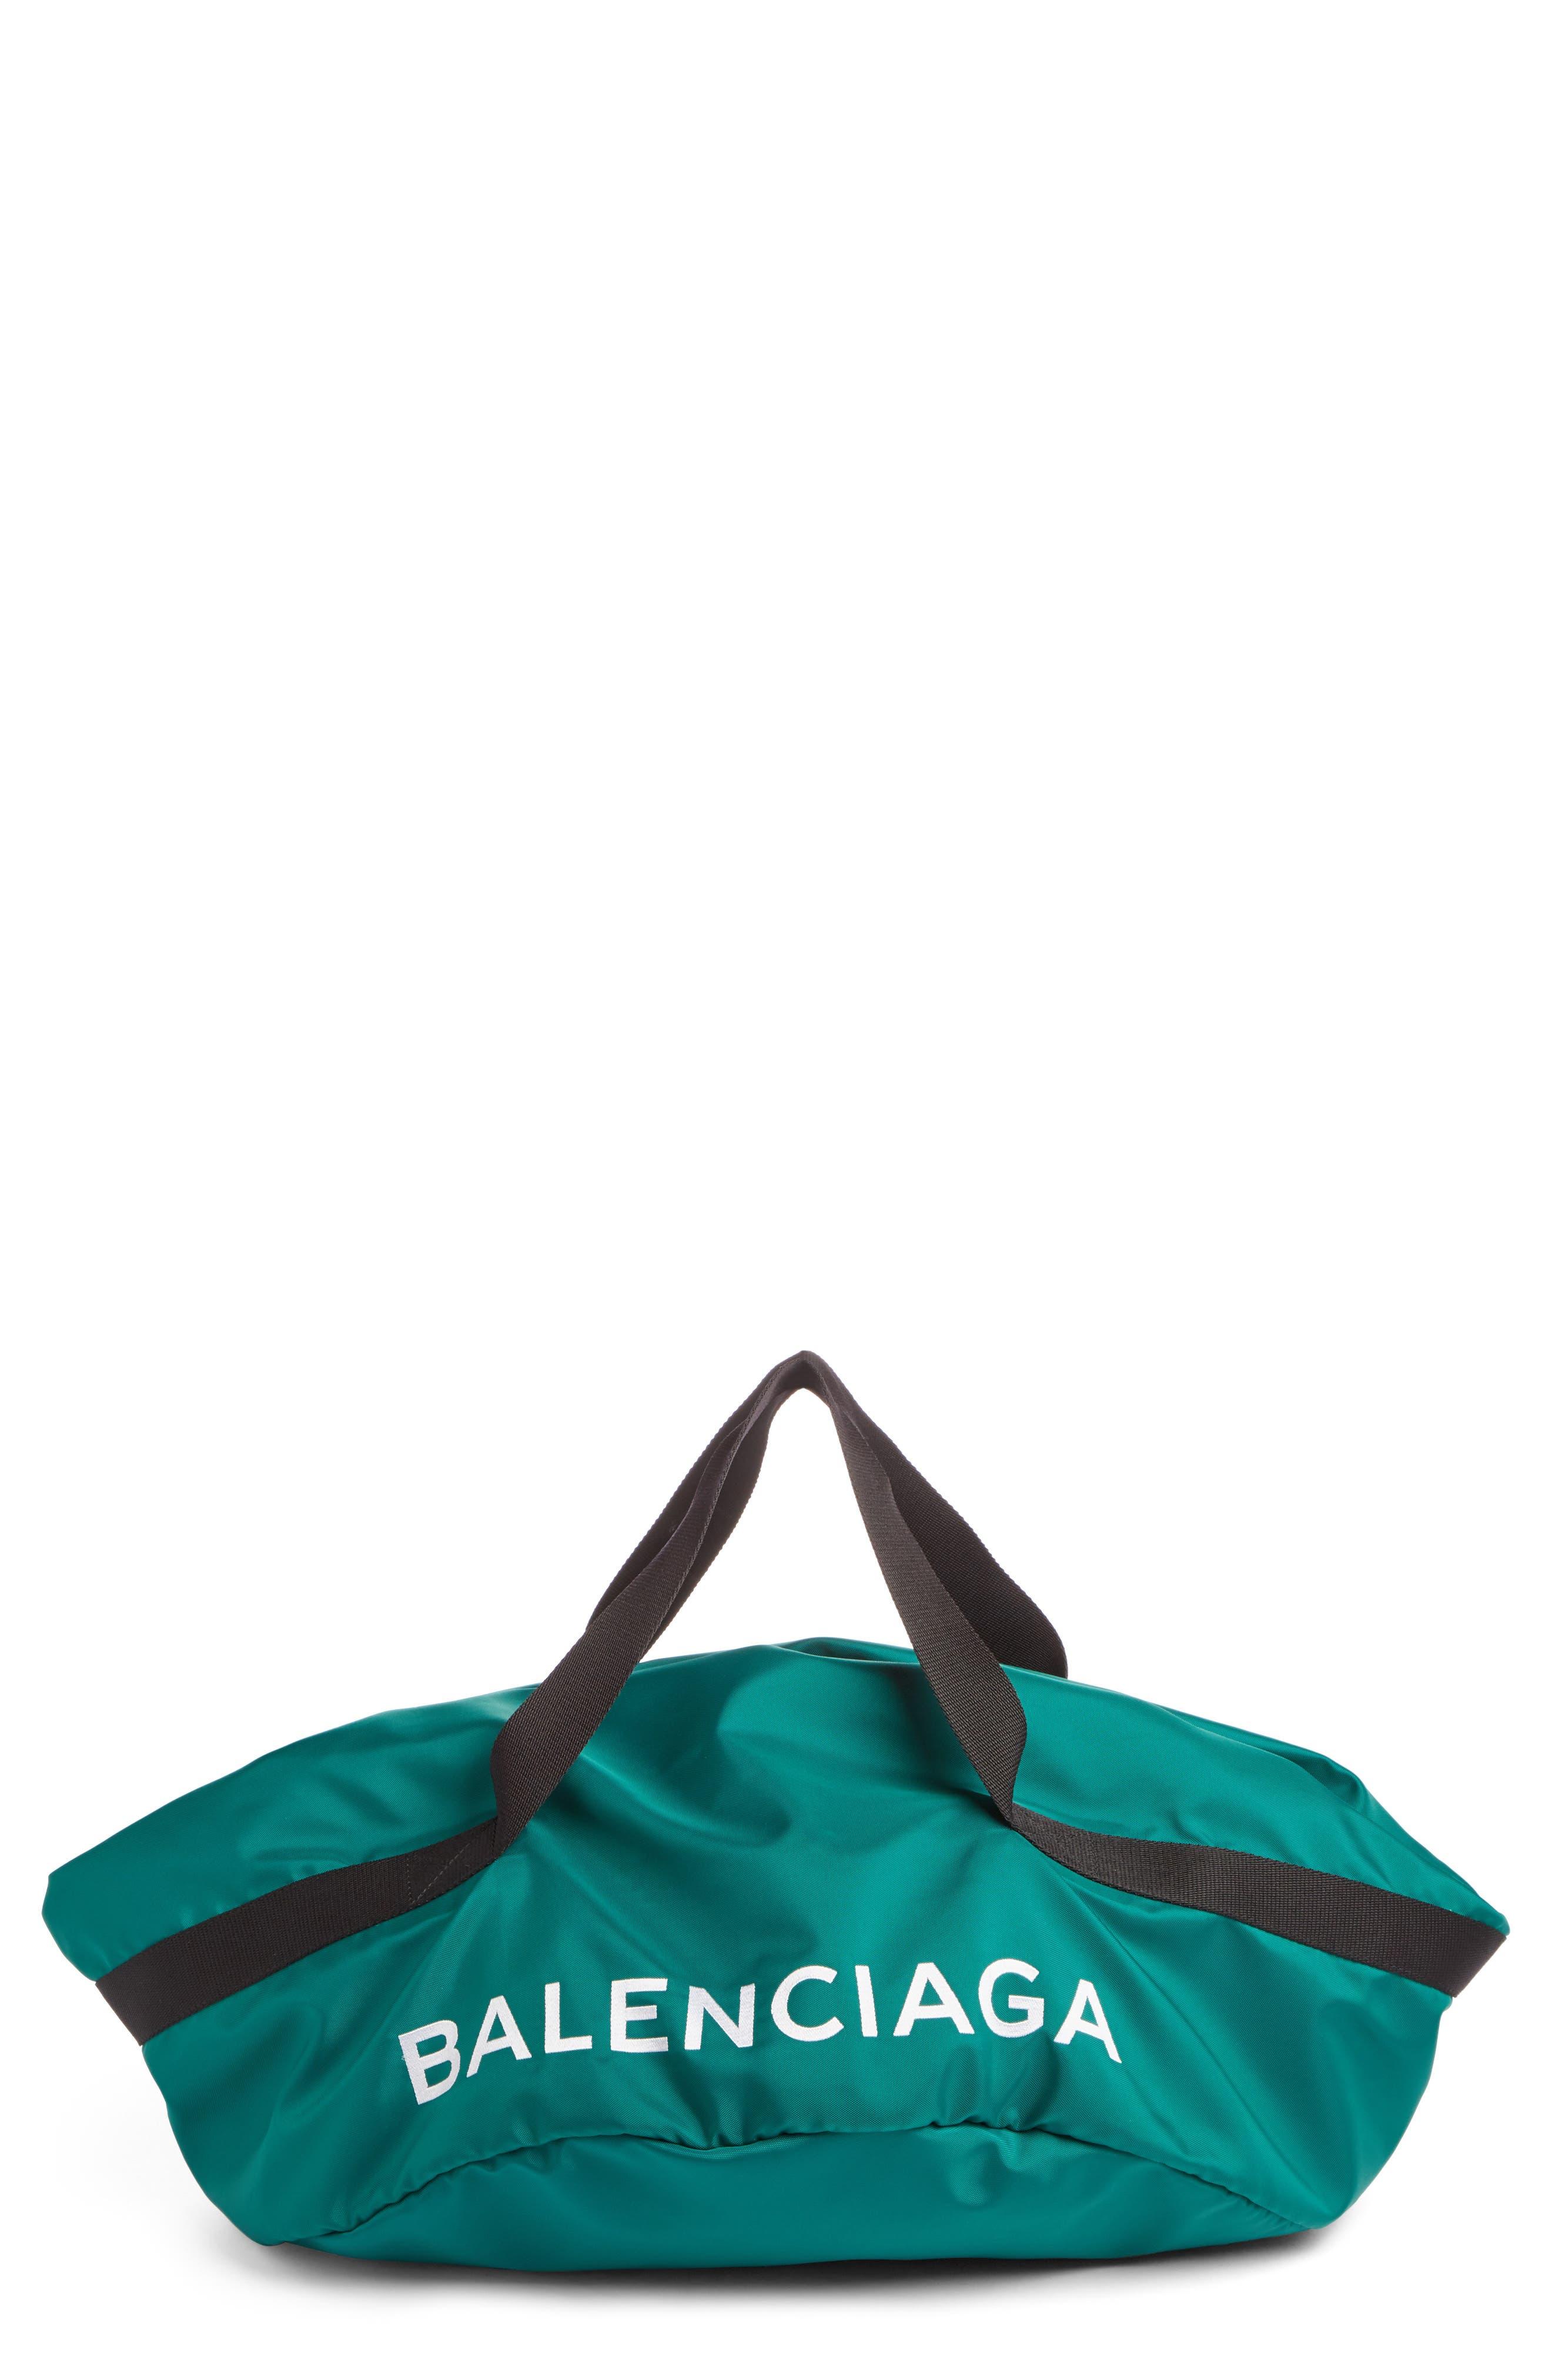 Small Wheel Bag,                         Main,                         color, Vert Emeraude/ Noir